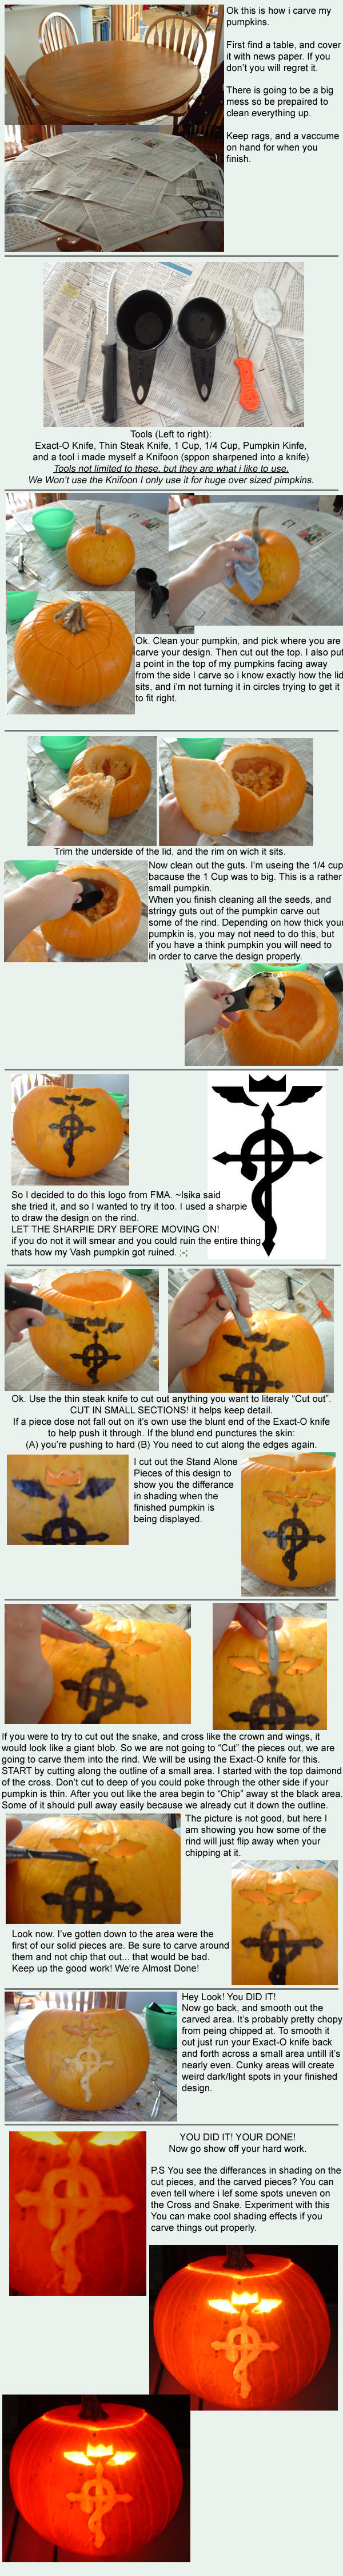 Pumpkin Carving Tutorial by FinnaJei